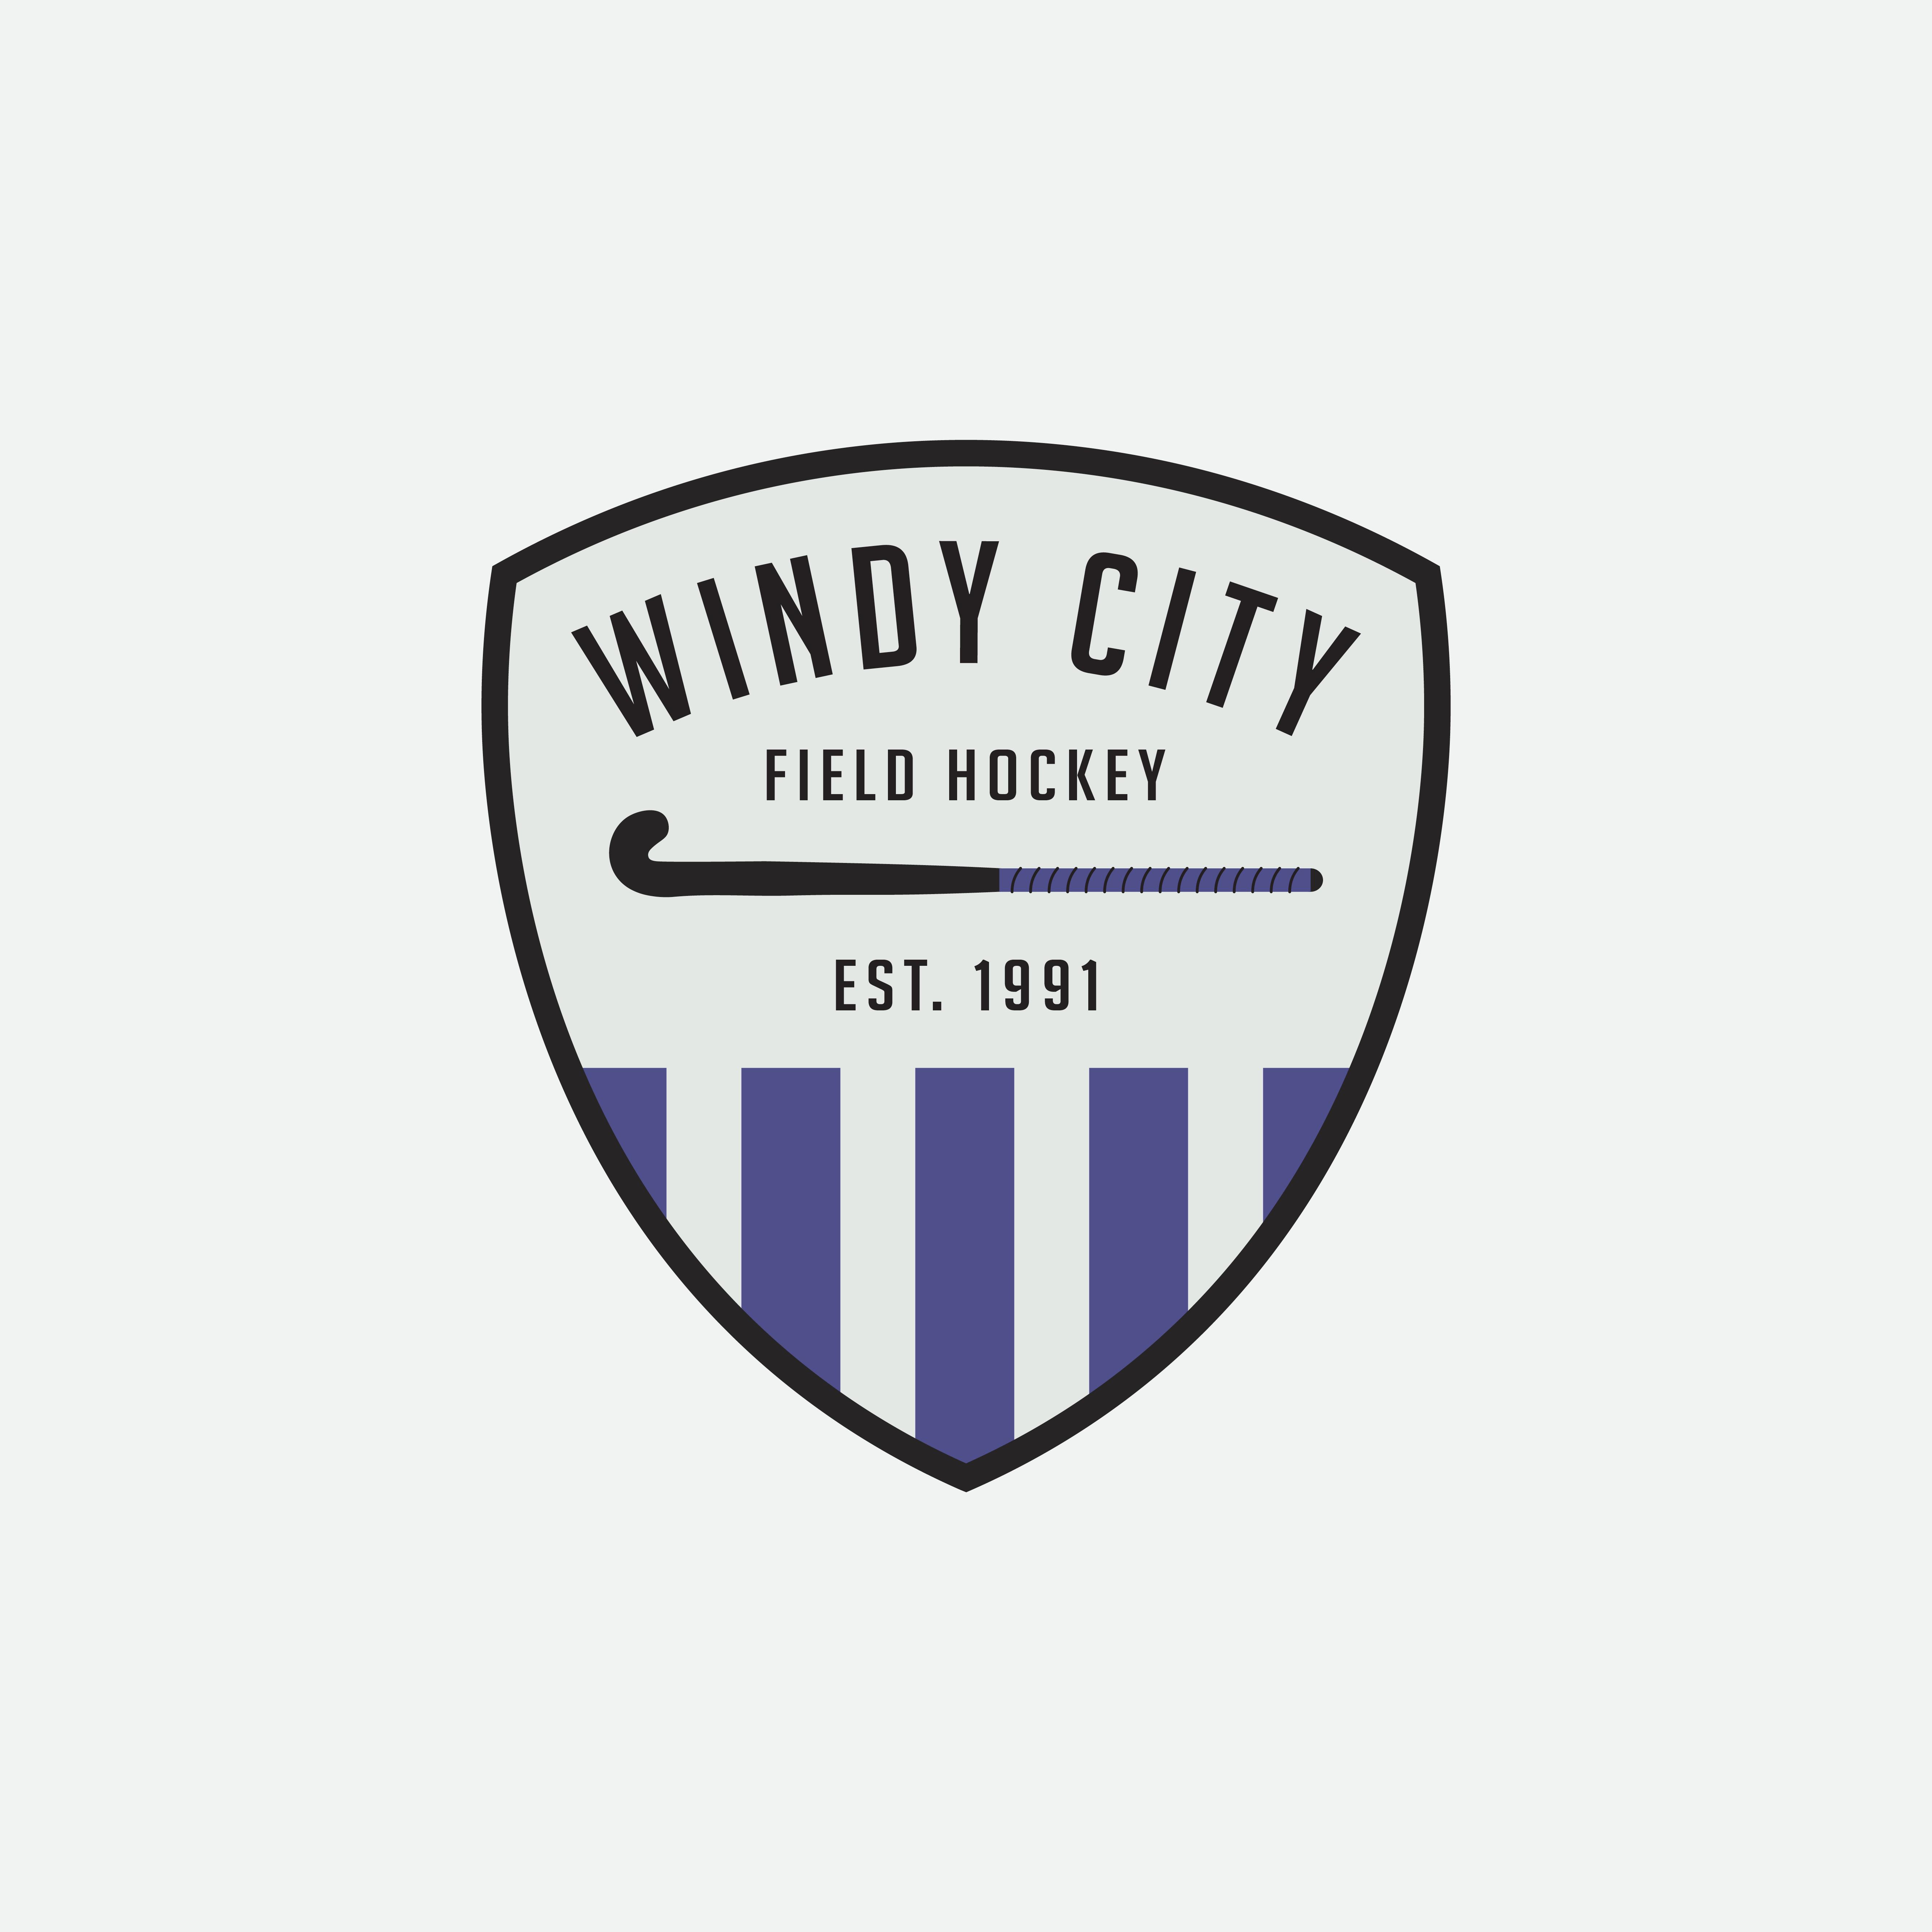 Windy City Field Hockey Logo Designed By Amari Creative Windycity Fieldhockey Amari Am Branding Design Studio Creative Branding Design Creative Branding